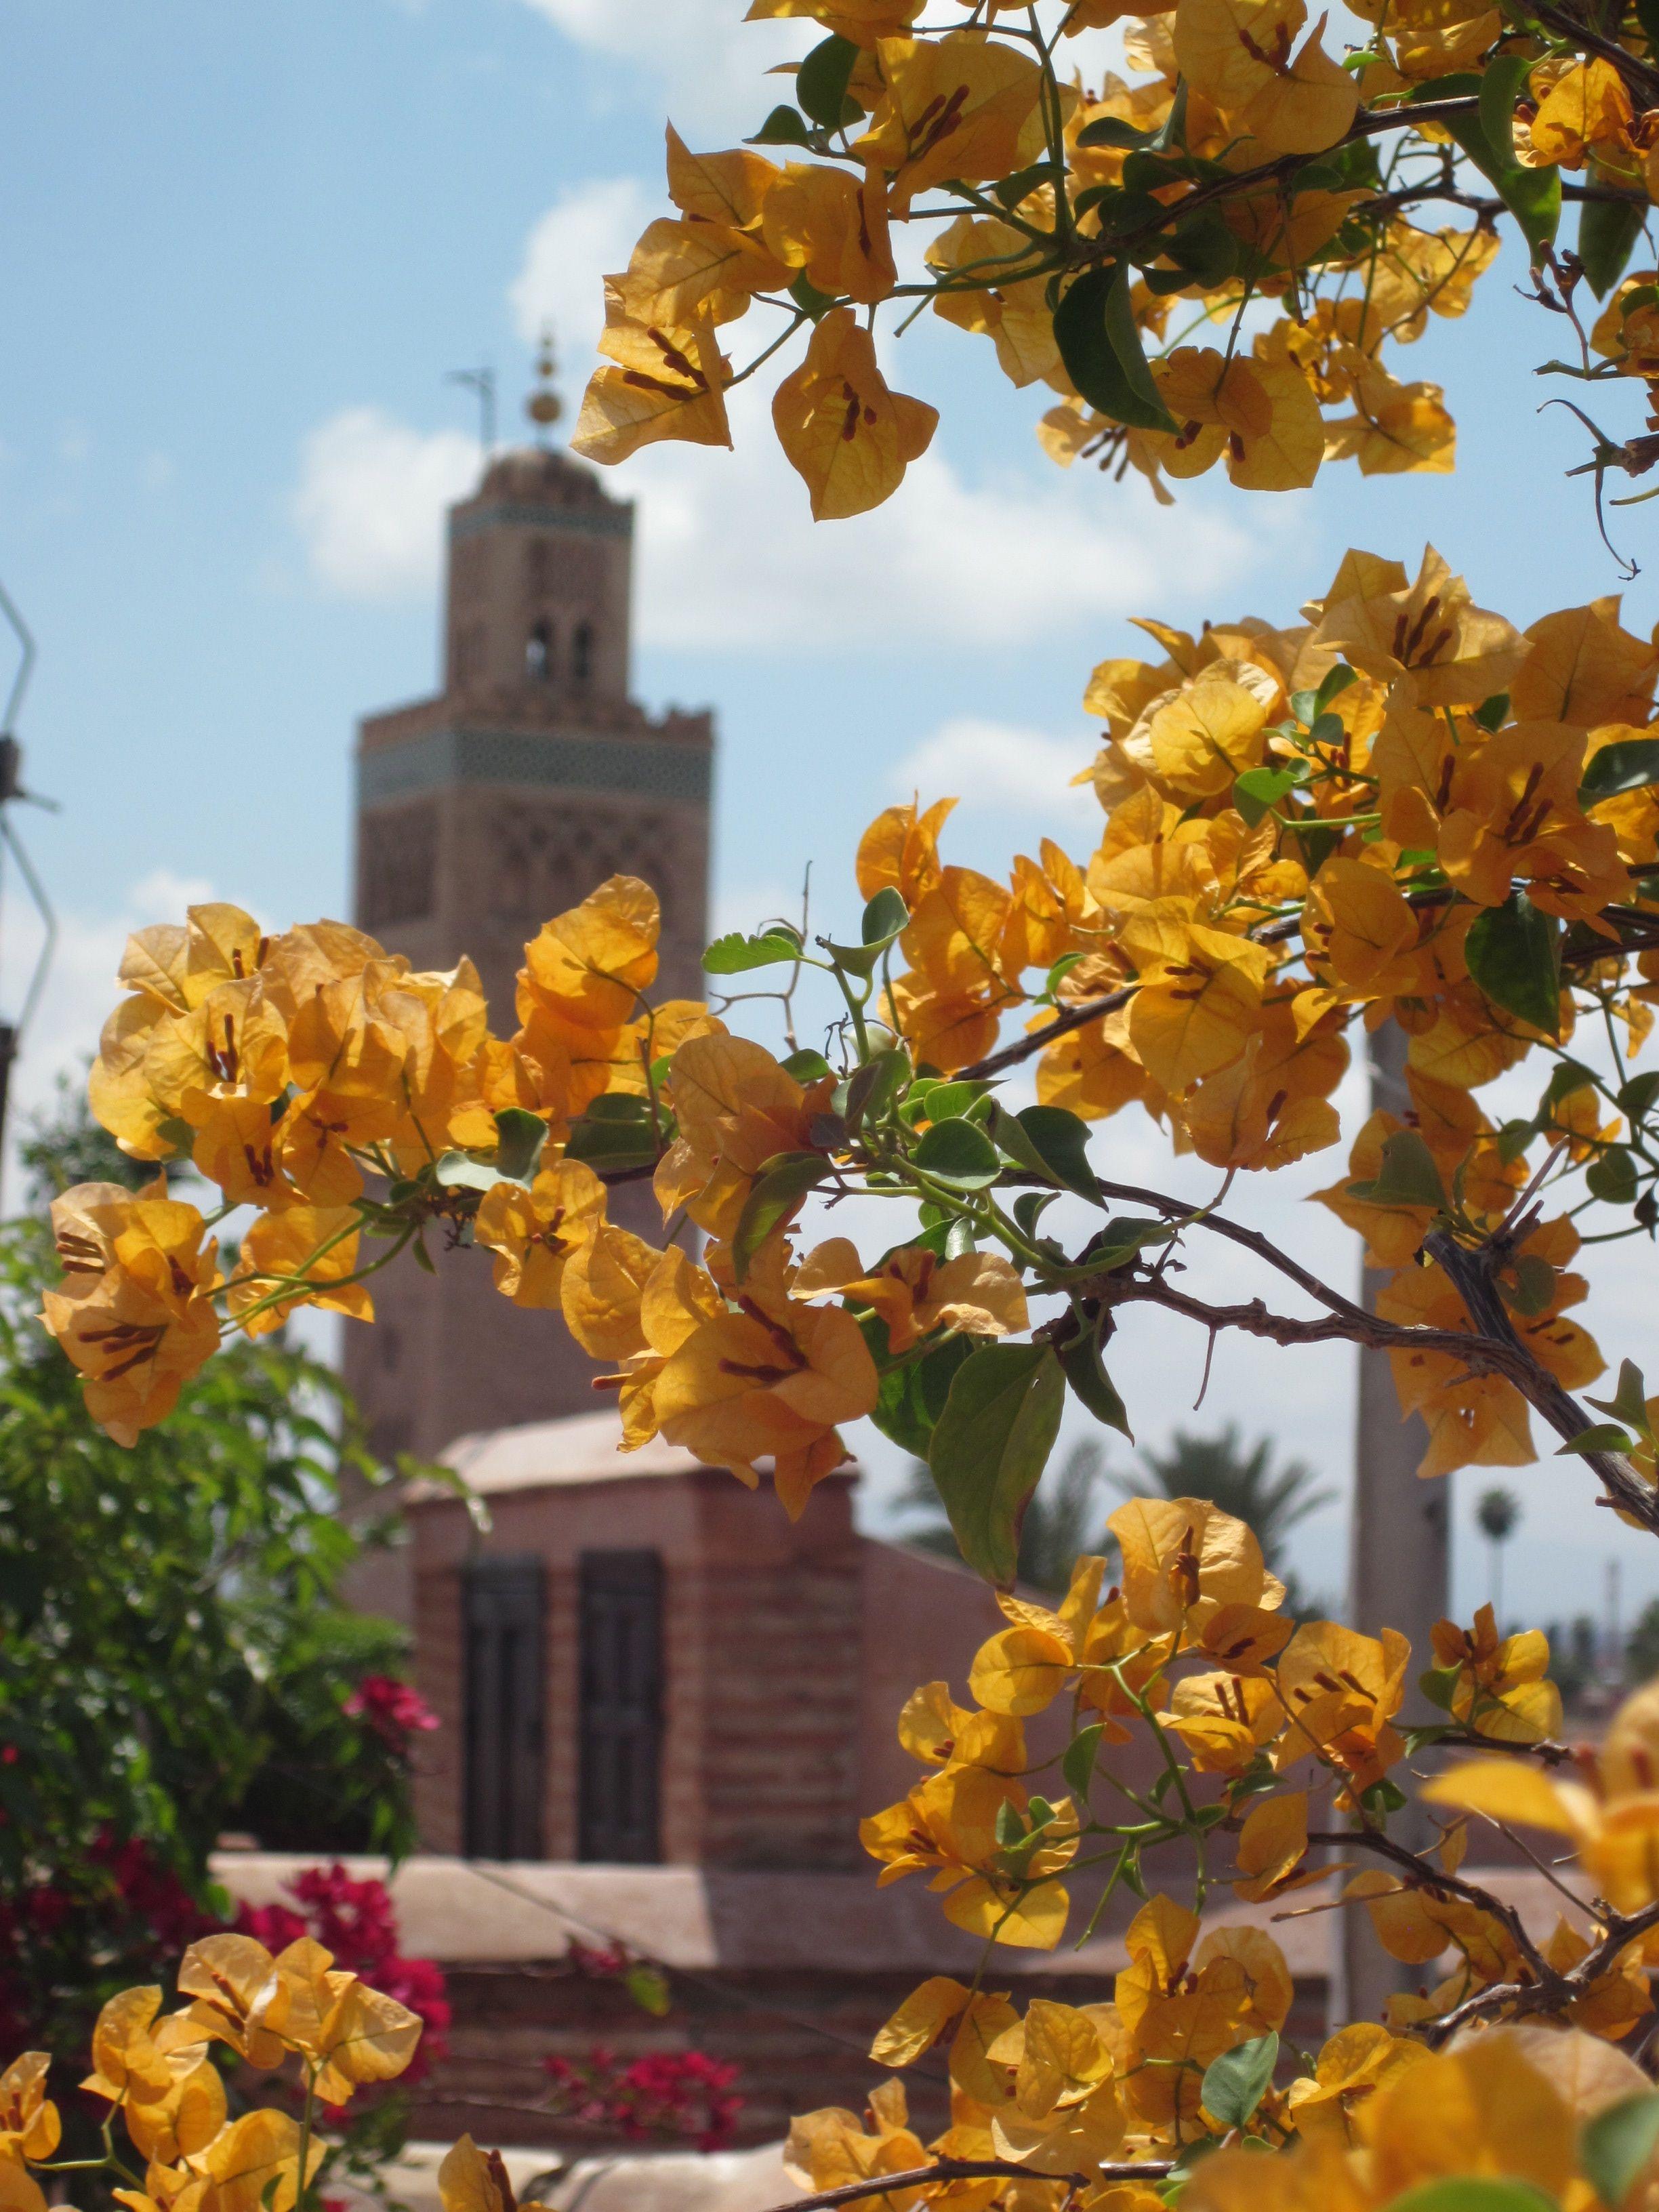 view from Riad el Fenn roof terrace - Marrakech, Morocco